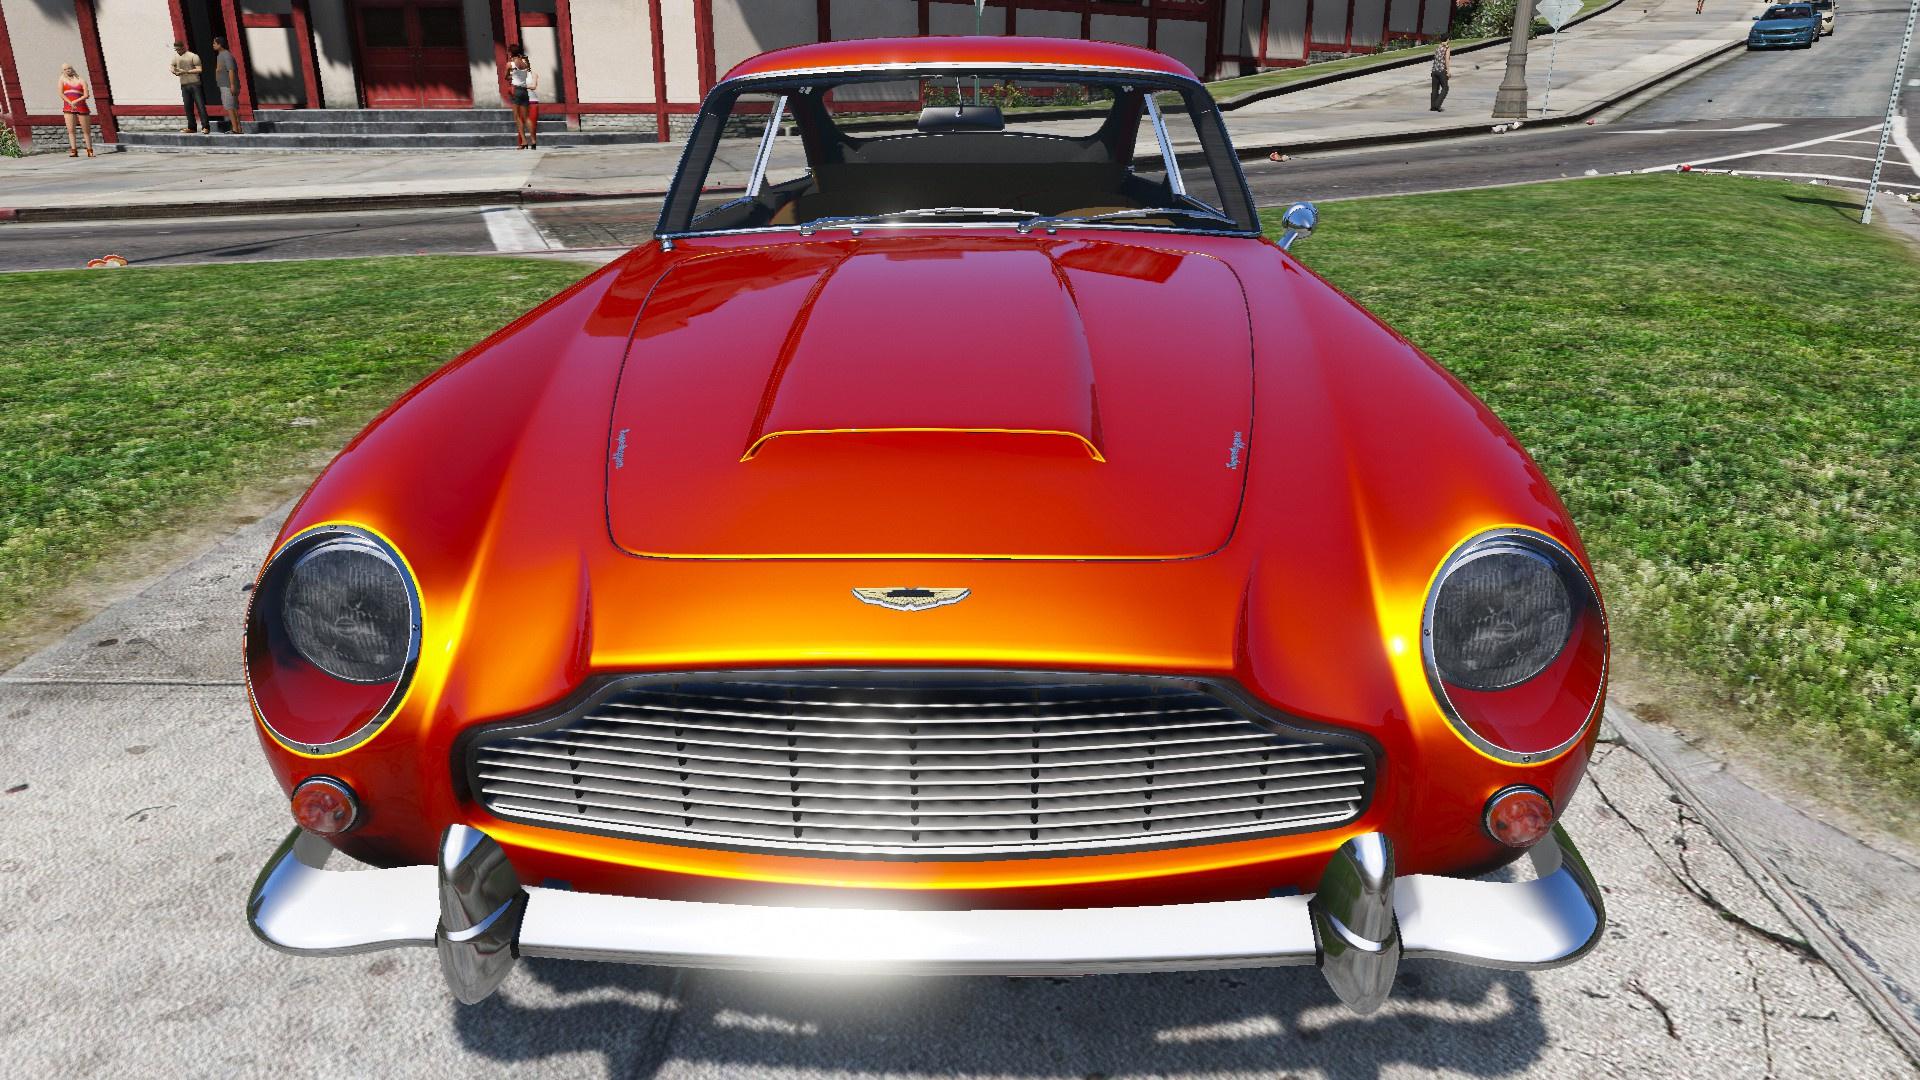 1964 Aston Martin DB5 Vantage GTA5 Mods